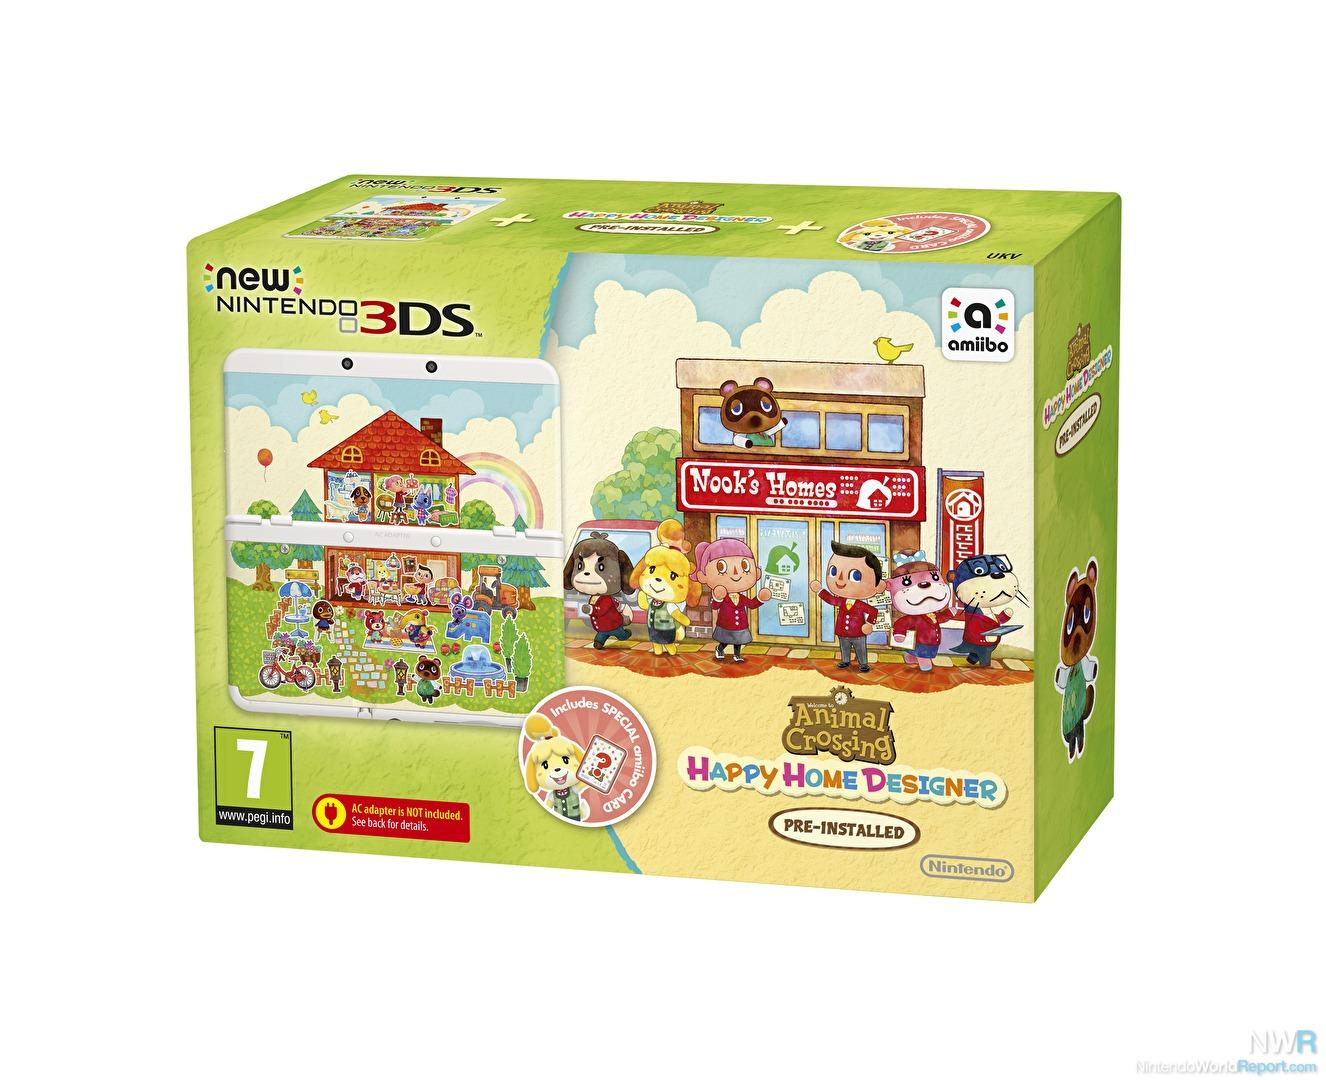 Animal Crossing: Happy Home Designer Bundles Announced for